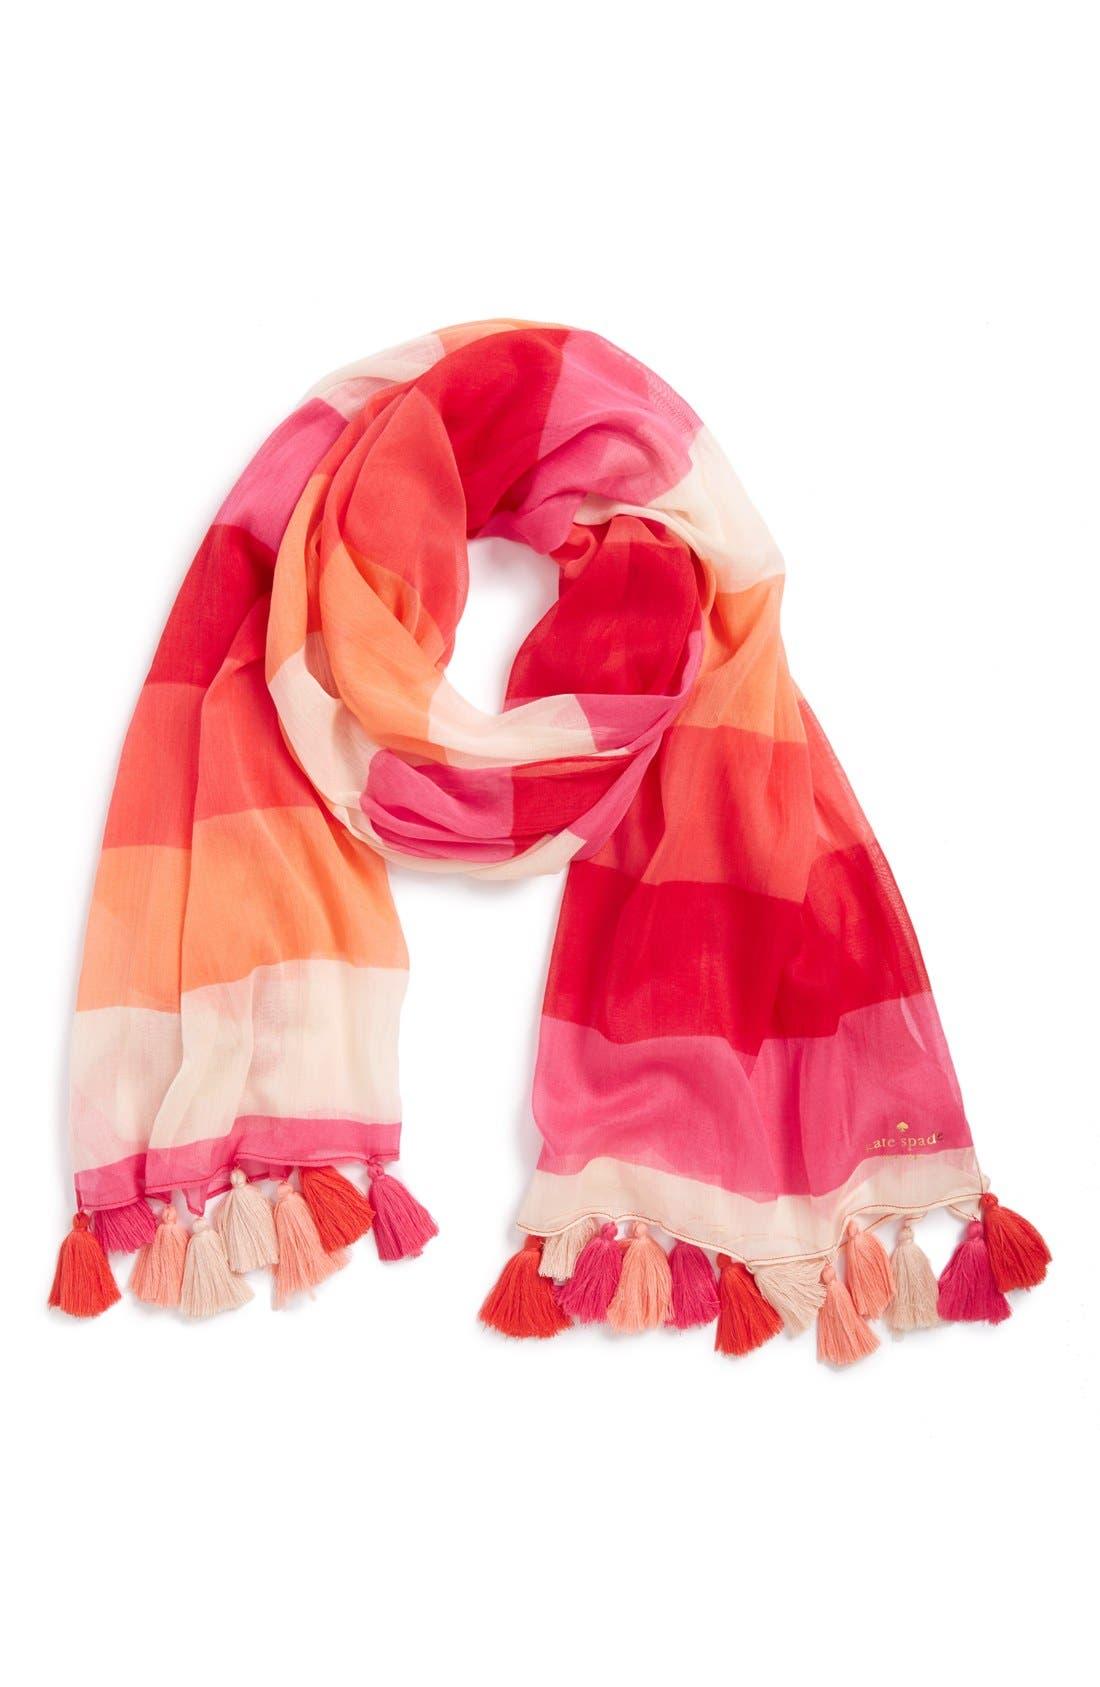 Alternate Image 1 Selected - kate spade new york 'ombré pom' colorblock scarf